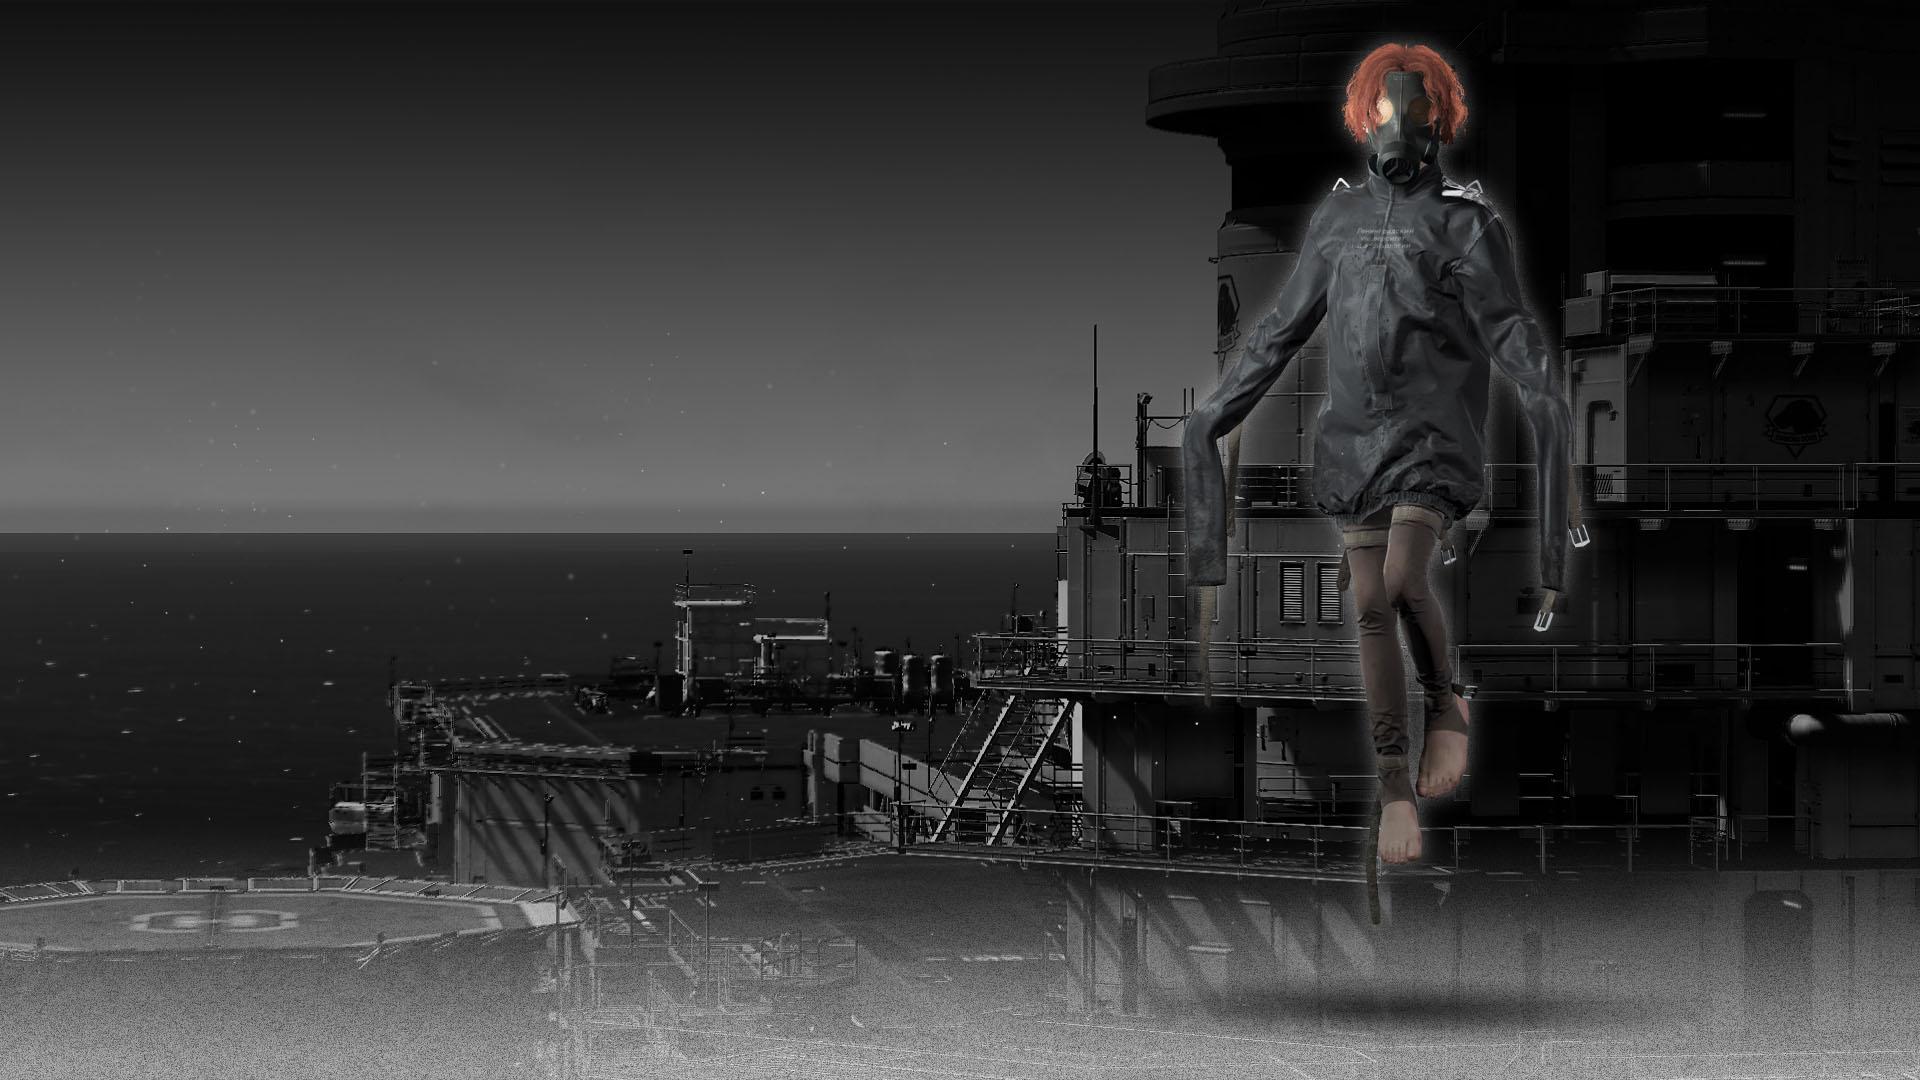 image - metal gear solid v the phantom pain artwork 5 | steam